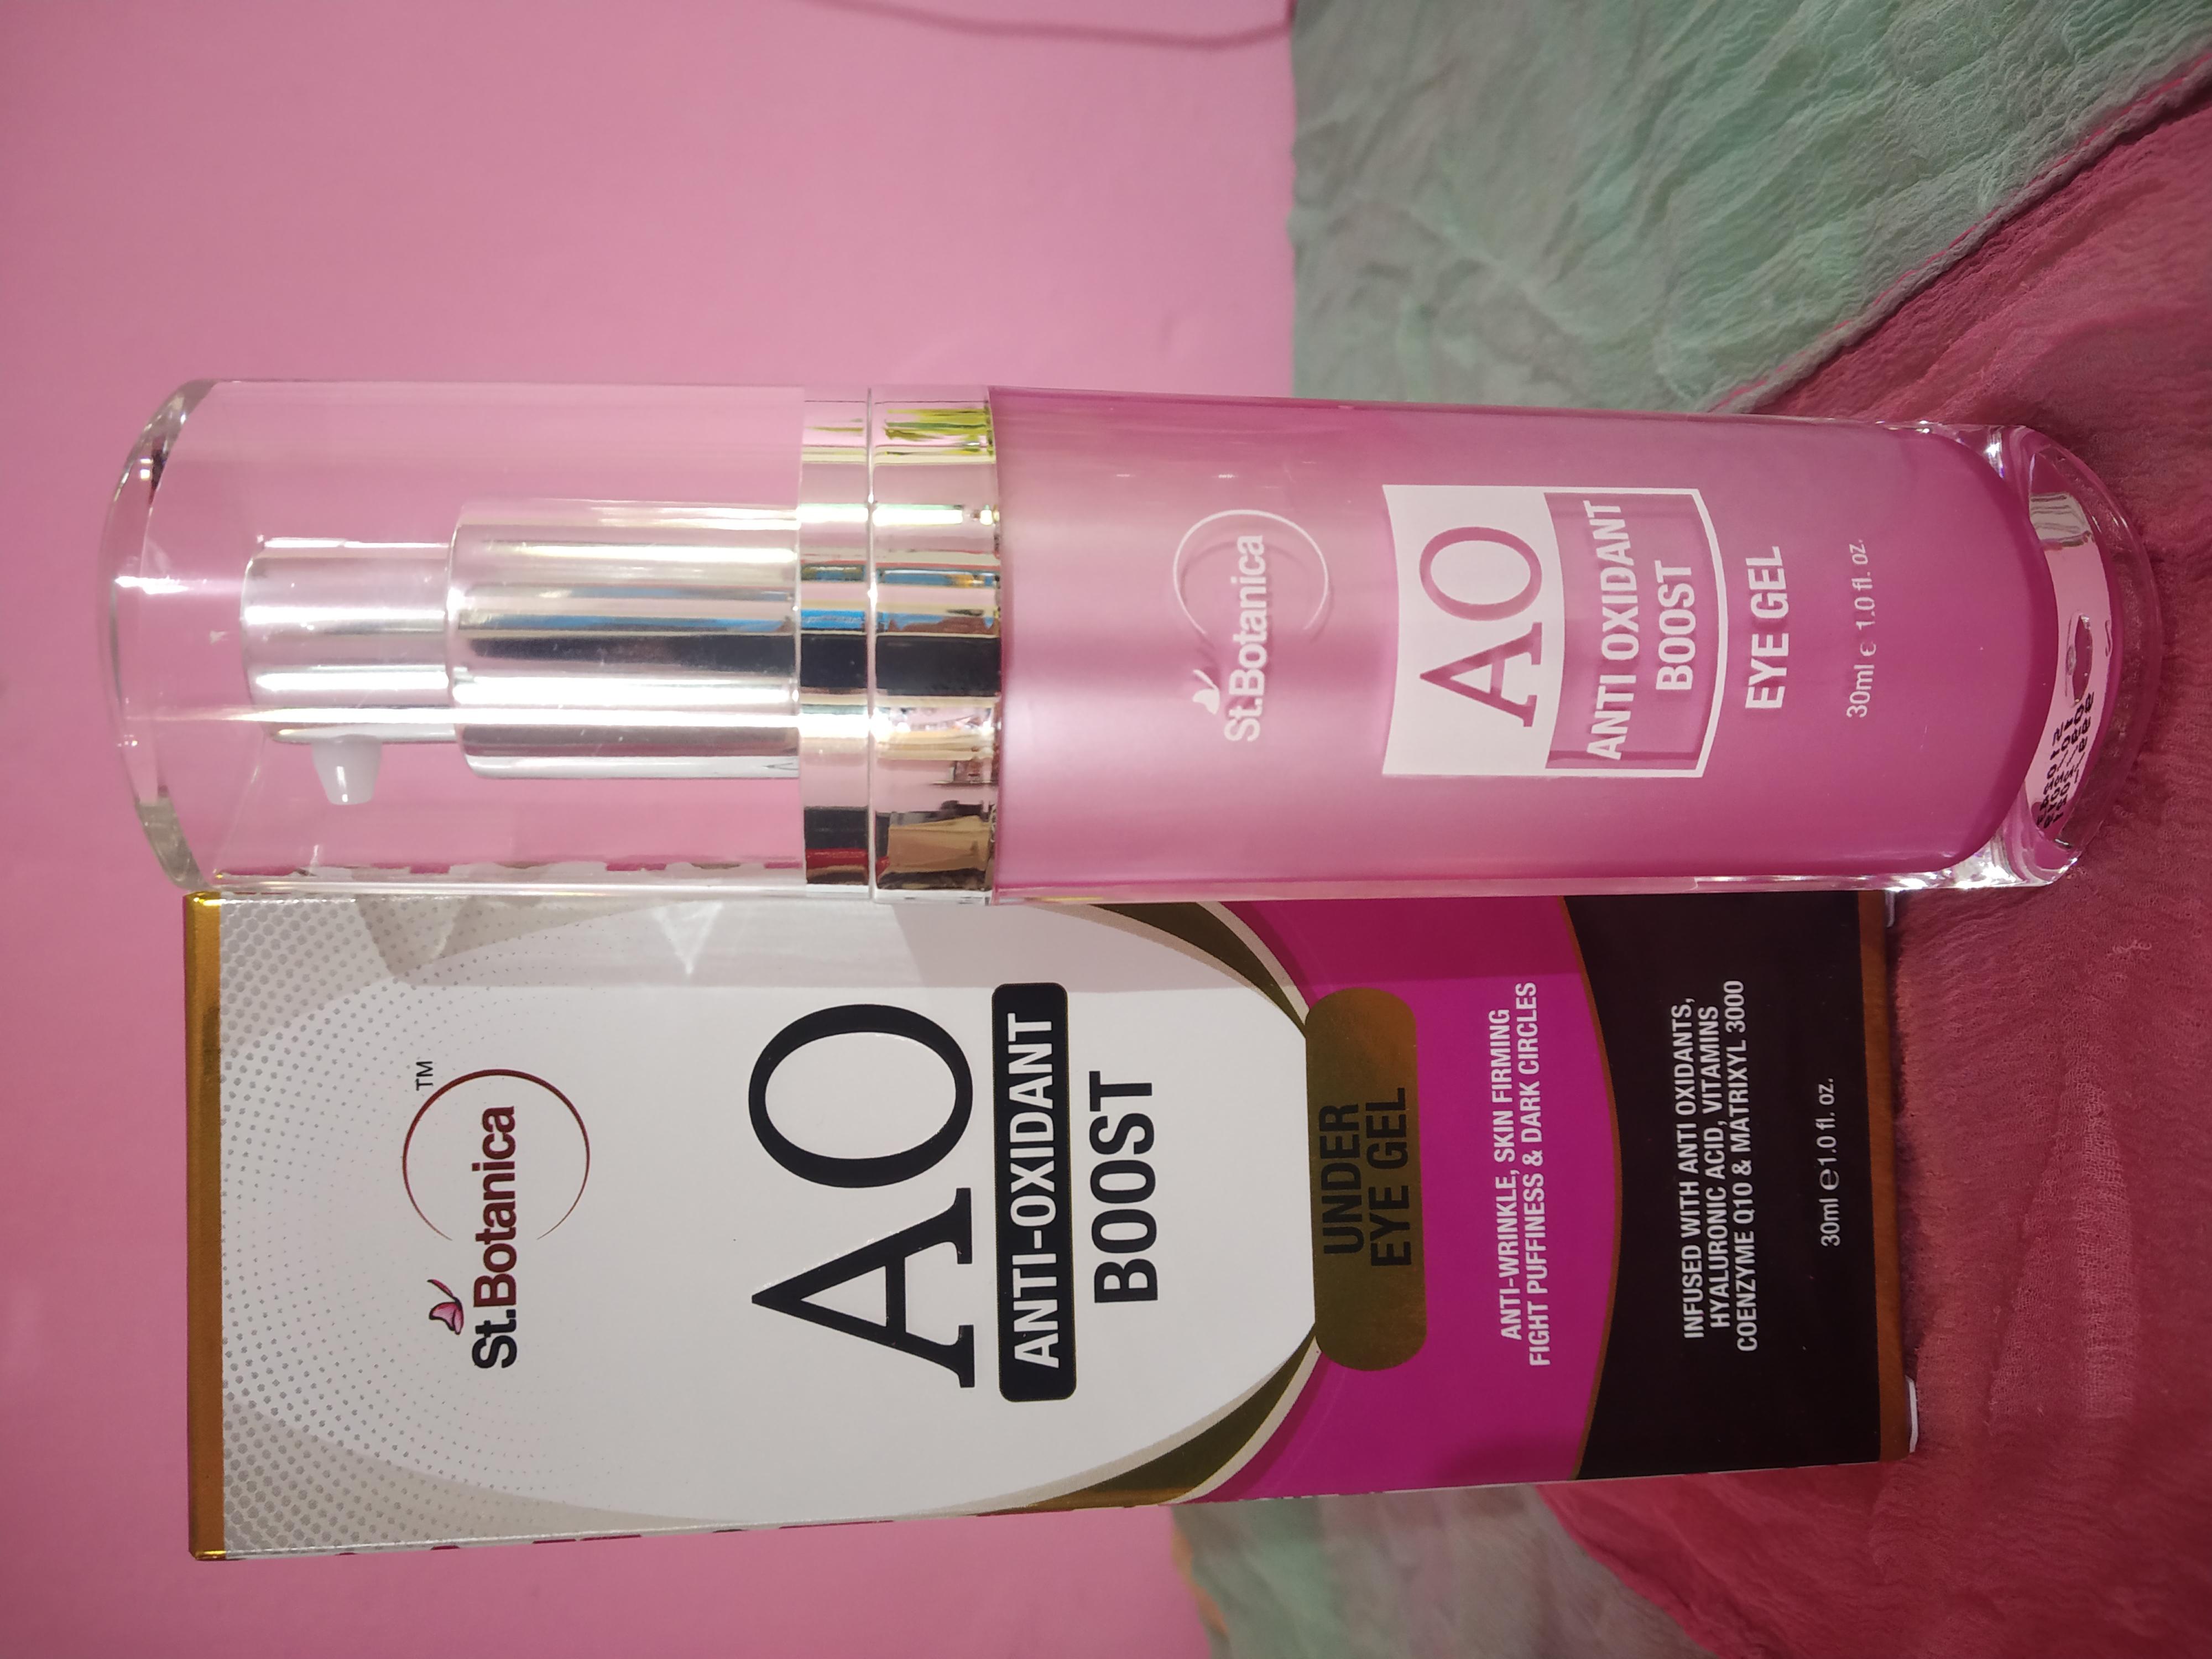 St.Botanica Anti Oxidant Boost Under Eye Gel -Must buy product-By shania03